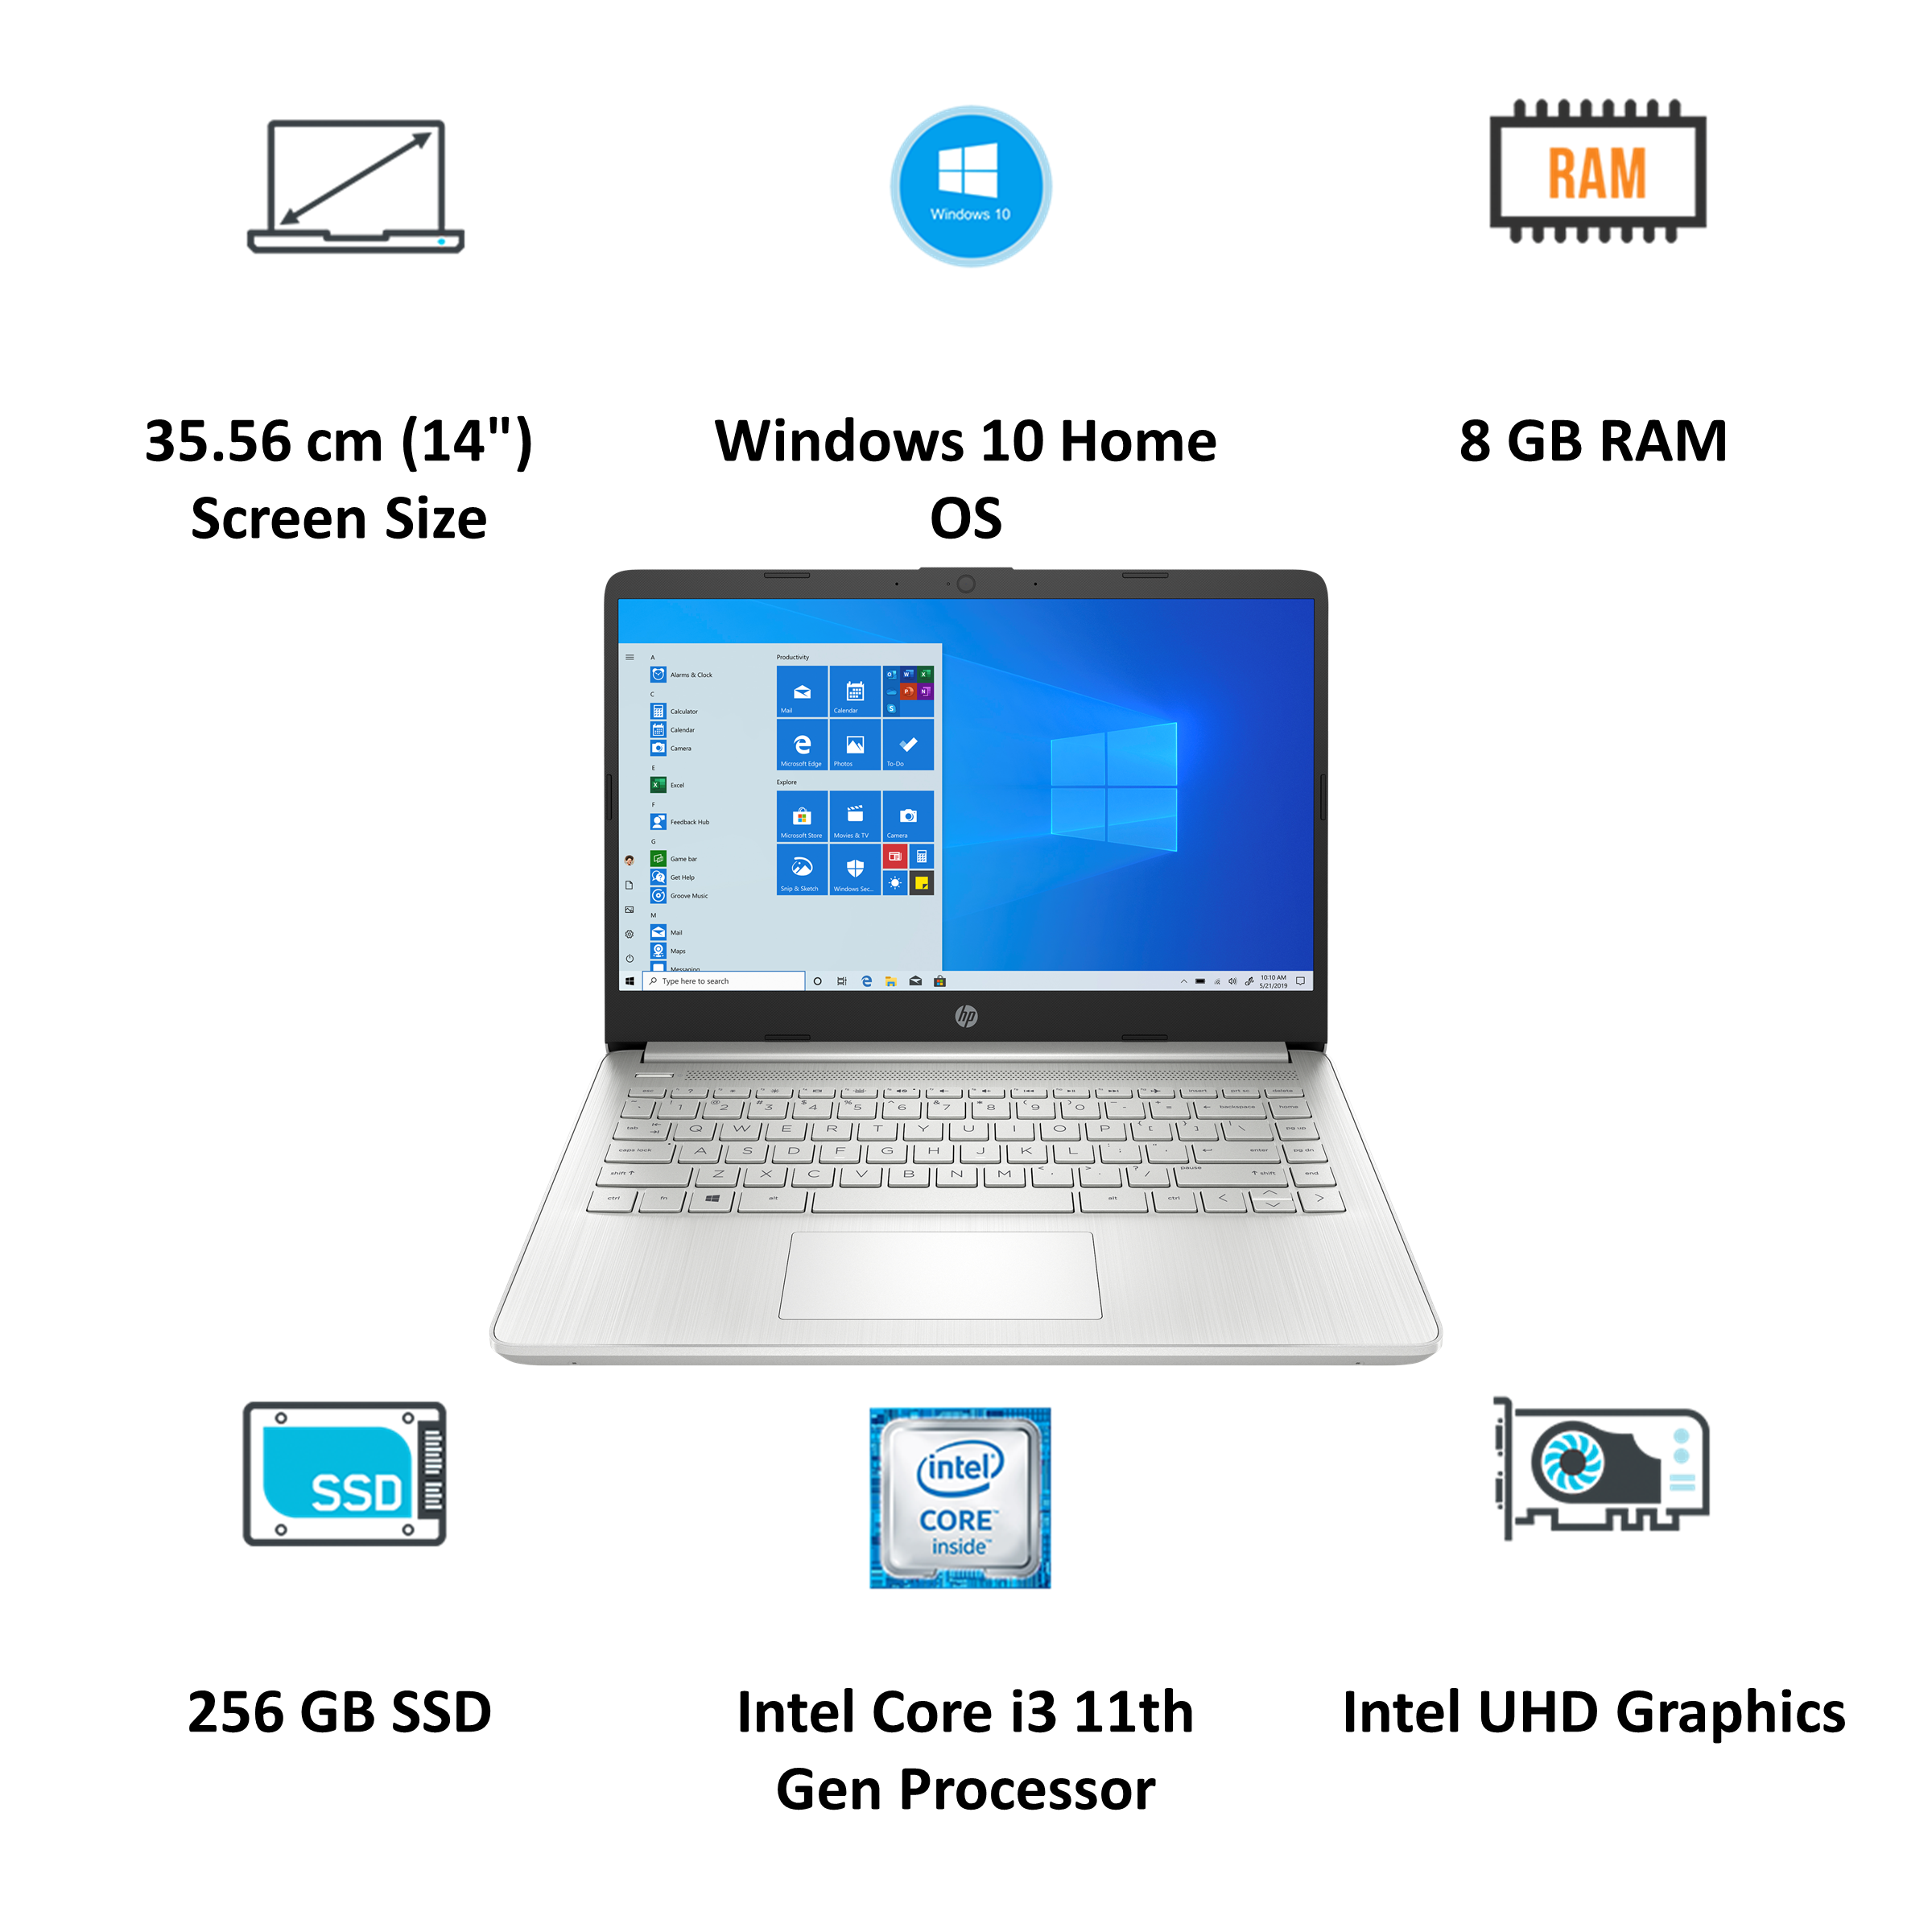 HP 14s-dq2101TU (38Z17PA#ACJ) Core i3 11th Gen Windows 10 Home Laptop (8GB RAM, 256GB SSD, Intel UHD Graphics, MS Office, 35.56cm, Natural Silver)_4